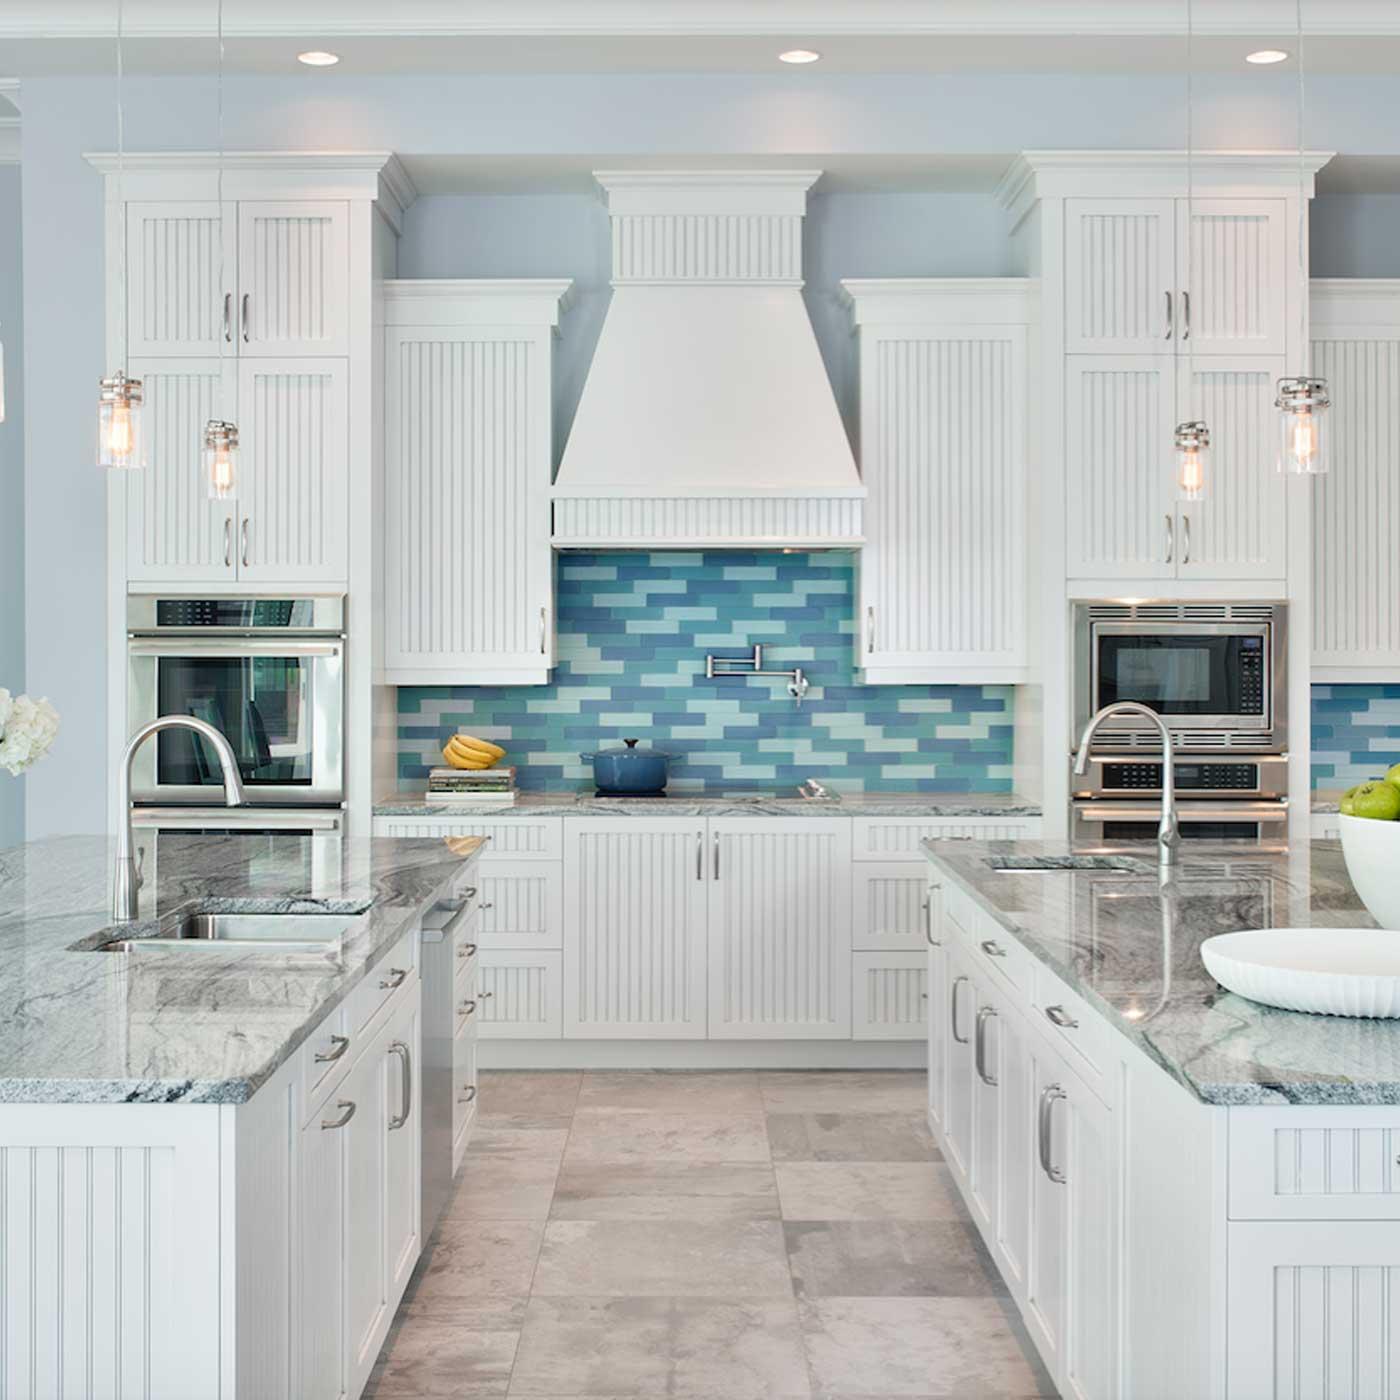 Tile Project Spotlight: Nelson Job designed by Ruben Sorhegui Tile Distributors | Southwest Florida's premier tile, stone, and custom mosaic tile distributor since 1983.